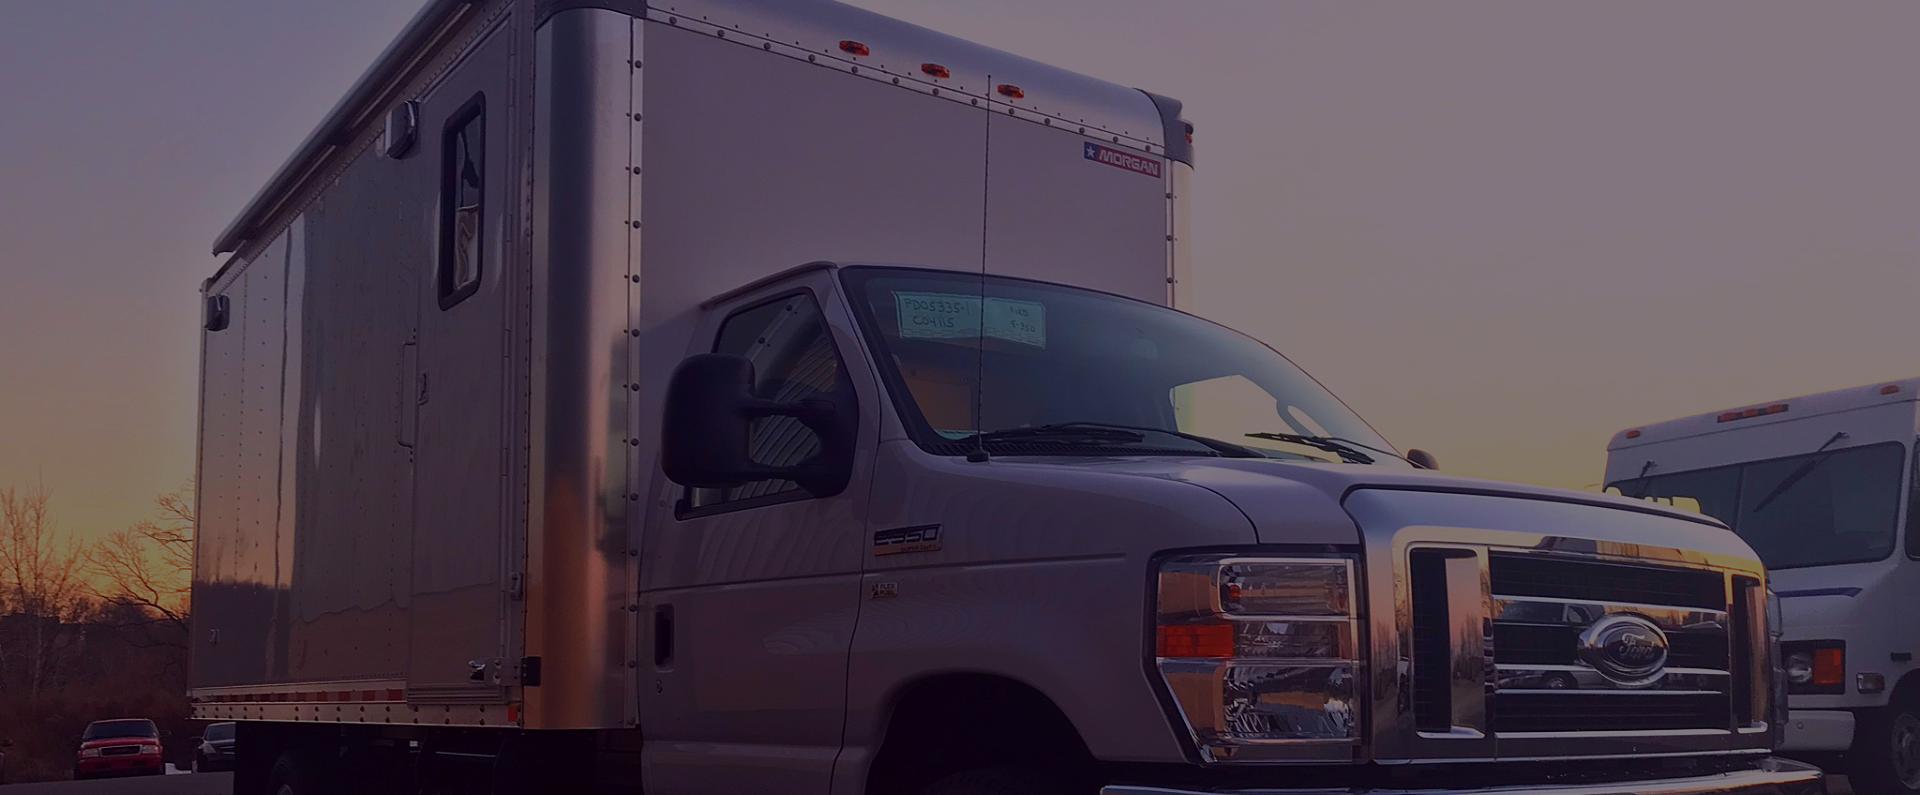 First Priority Emergency Vehicles Custom Box Trucks Specialty Vehicles